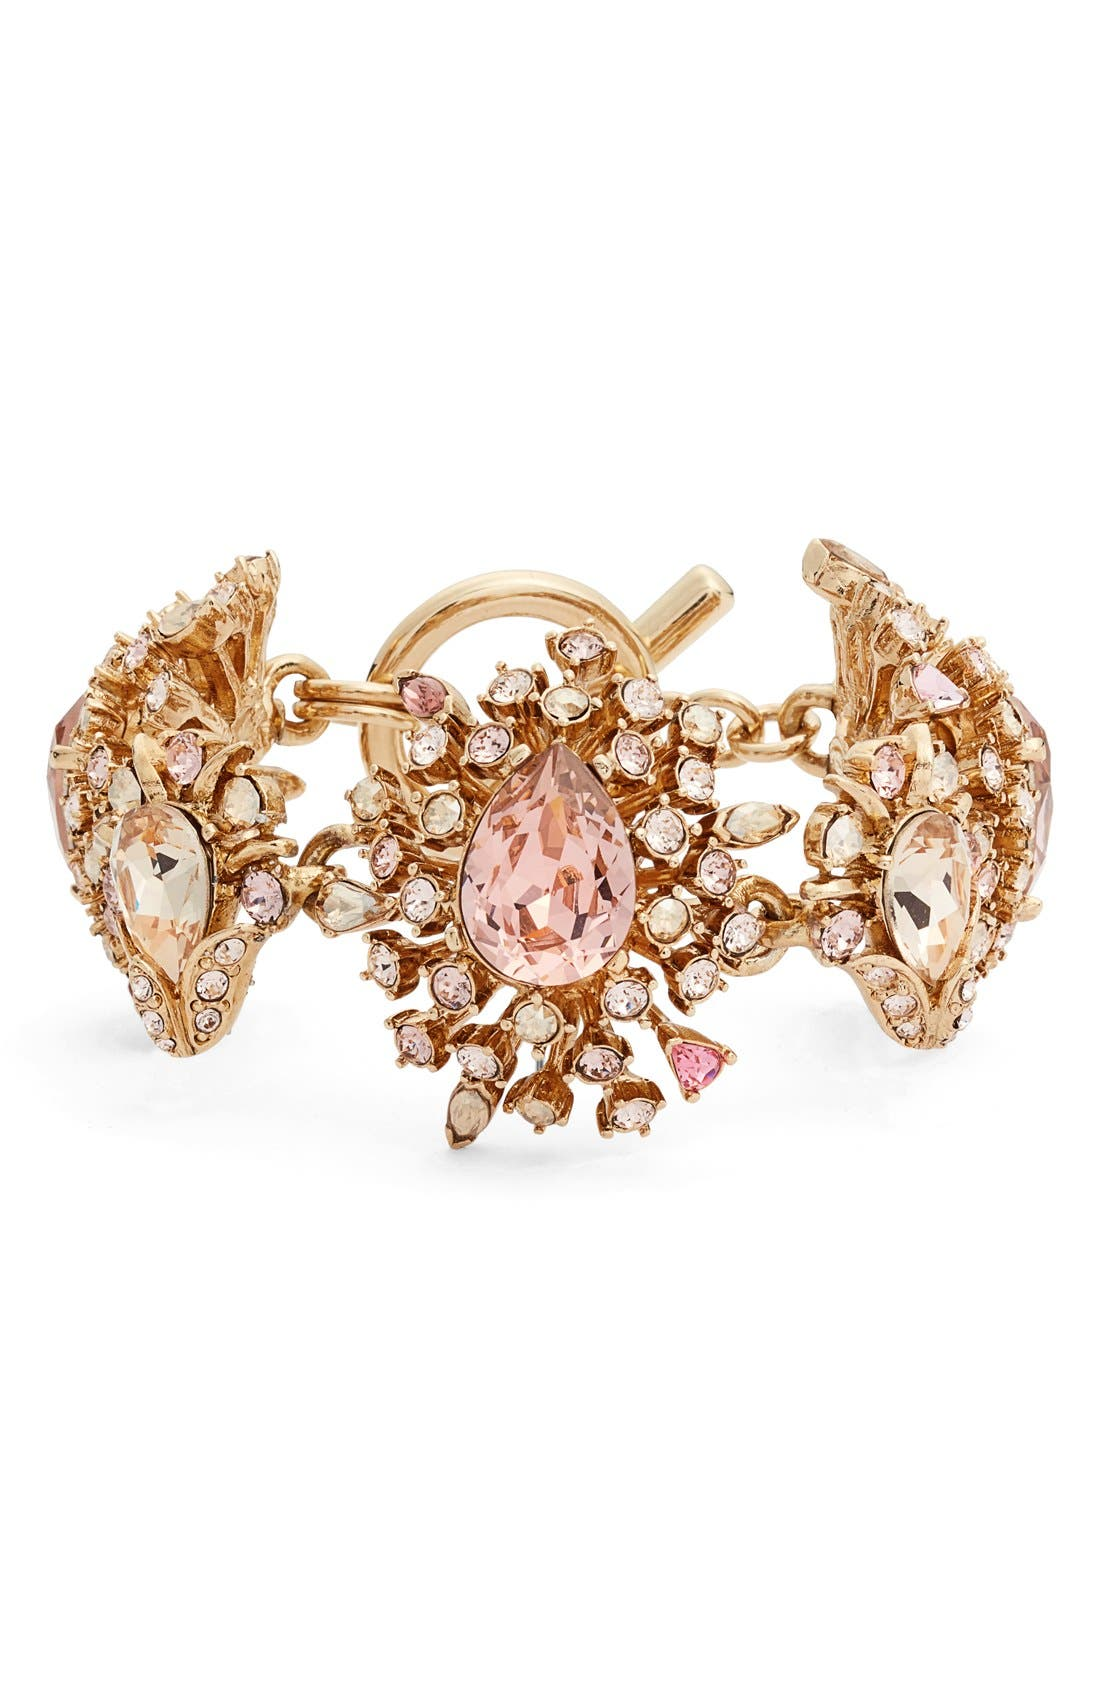 Oscar de la Renta Swarovski Crystal Line Bracelet